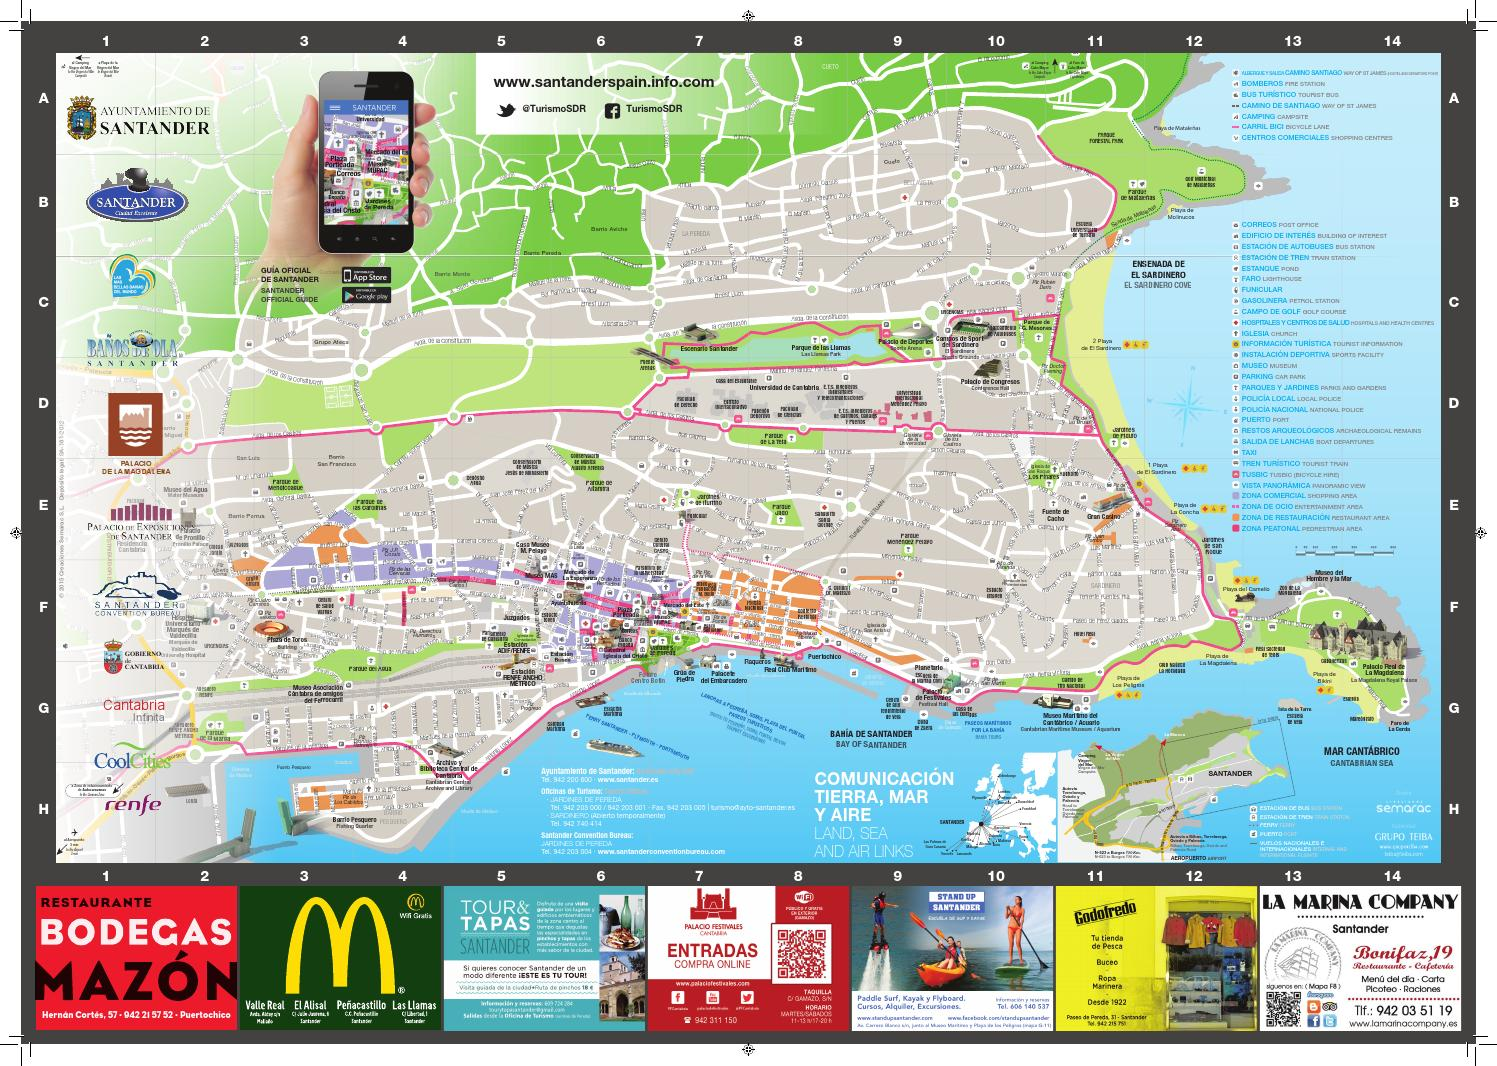 Plano turistico de santander by cantabria turismo issuu for Mapa santander sucursales